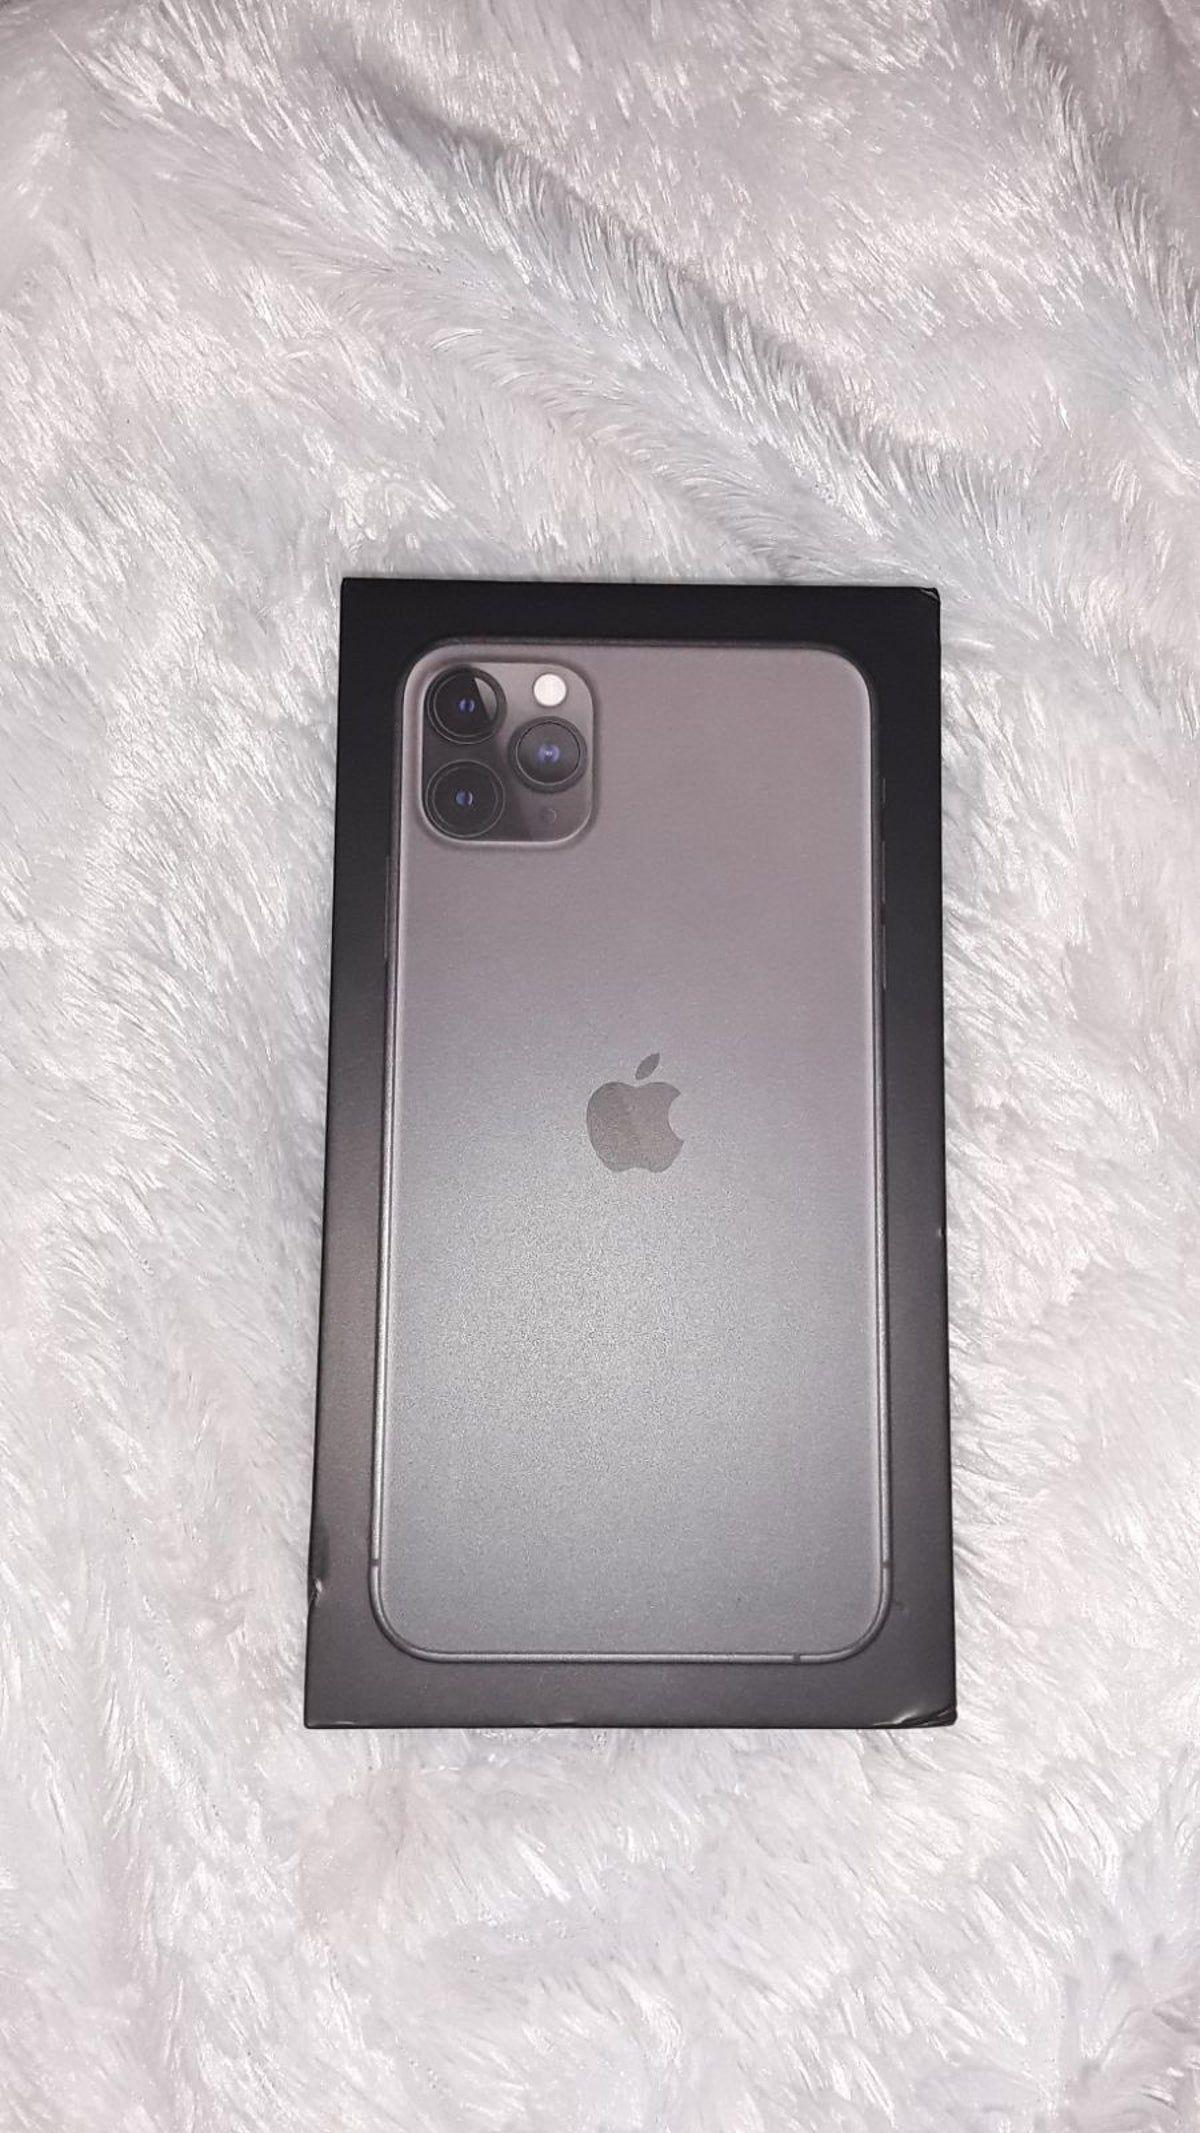 Iphone 11 Pro Max Box Iphone Iphone 11 Iphone Cases